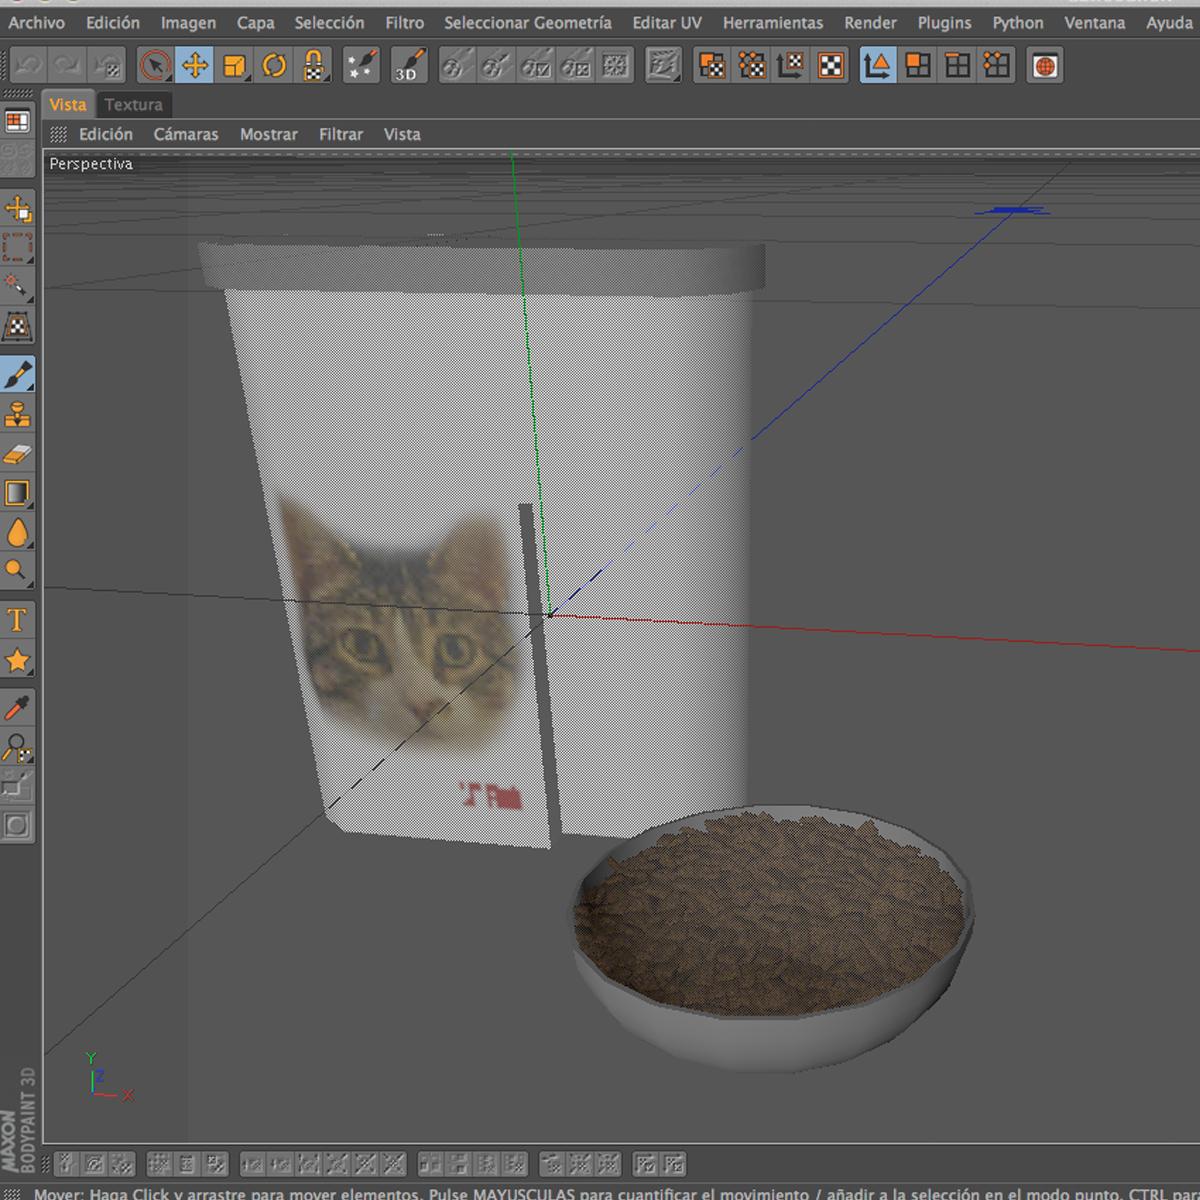 kaķu barība 3d modelis 3ds max fbx c4d ma mb obj 159465